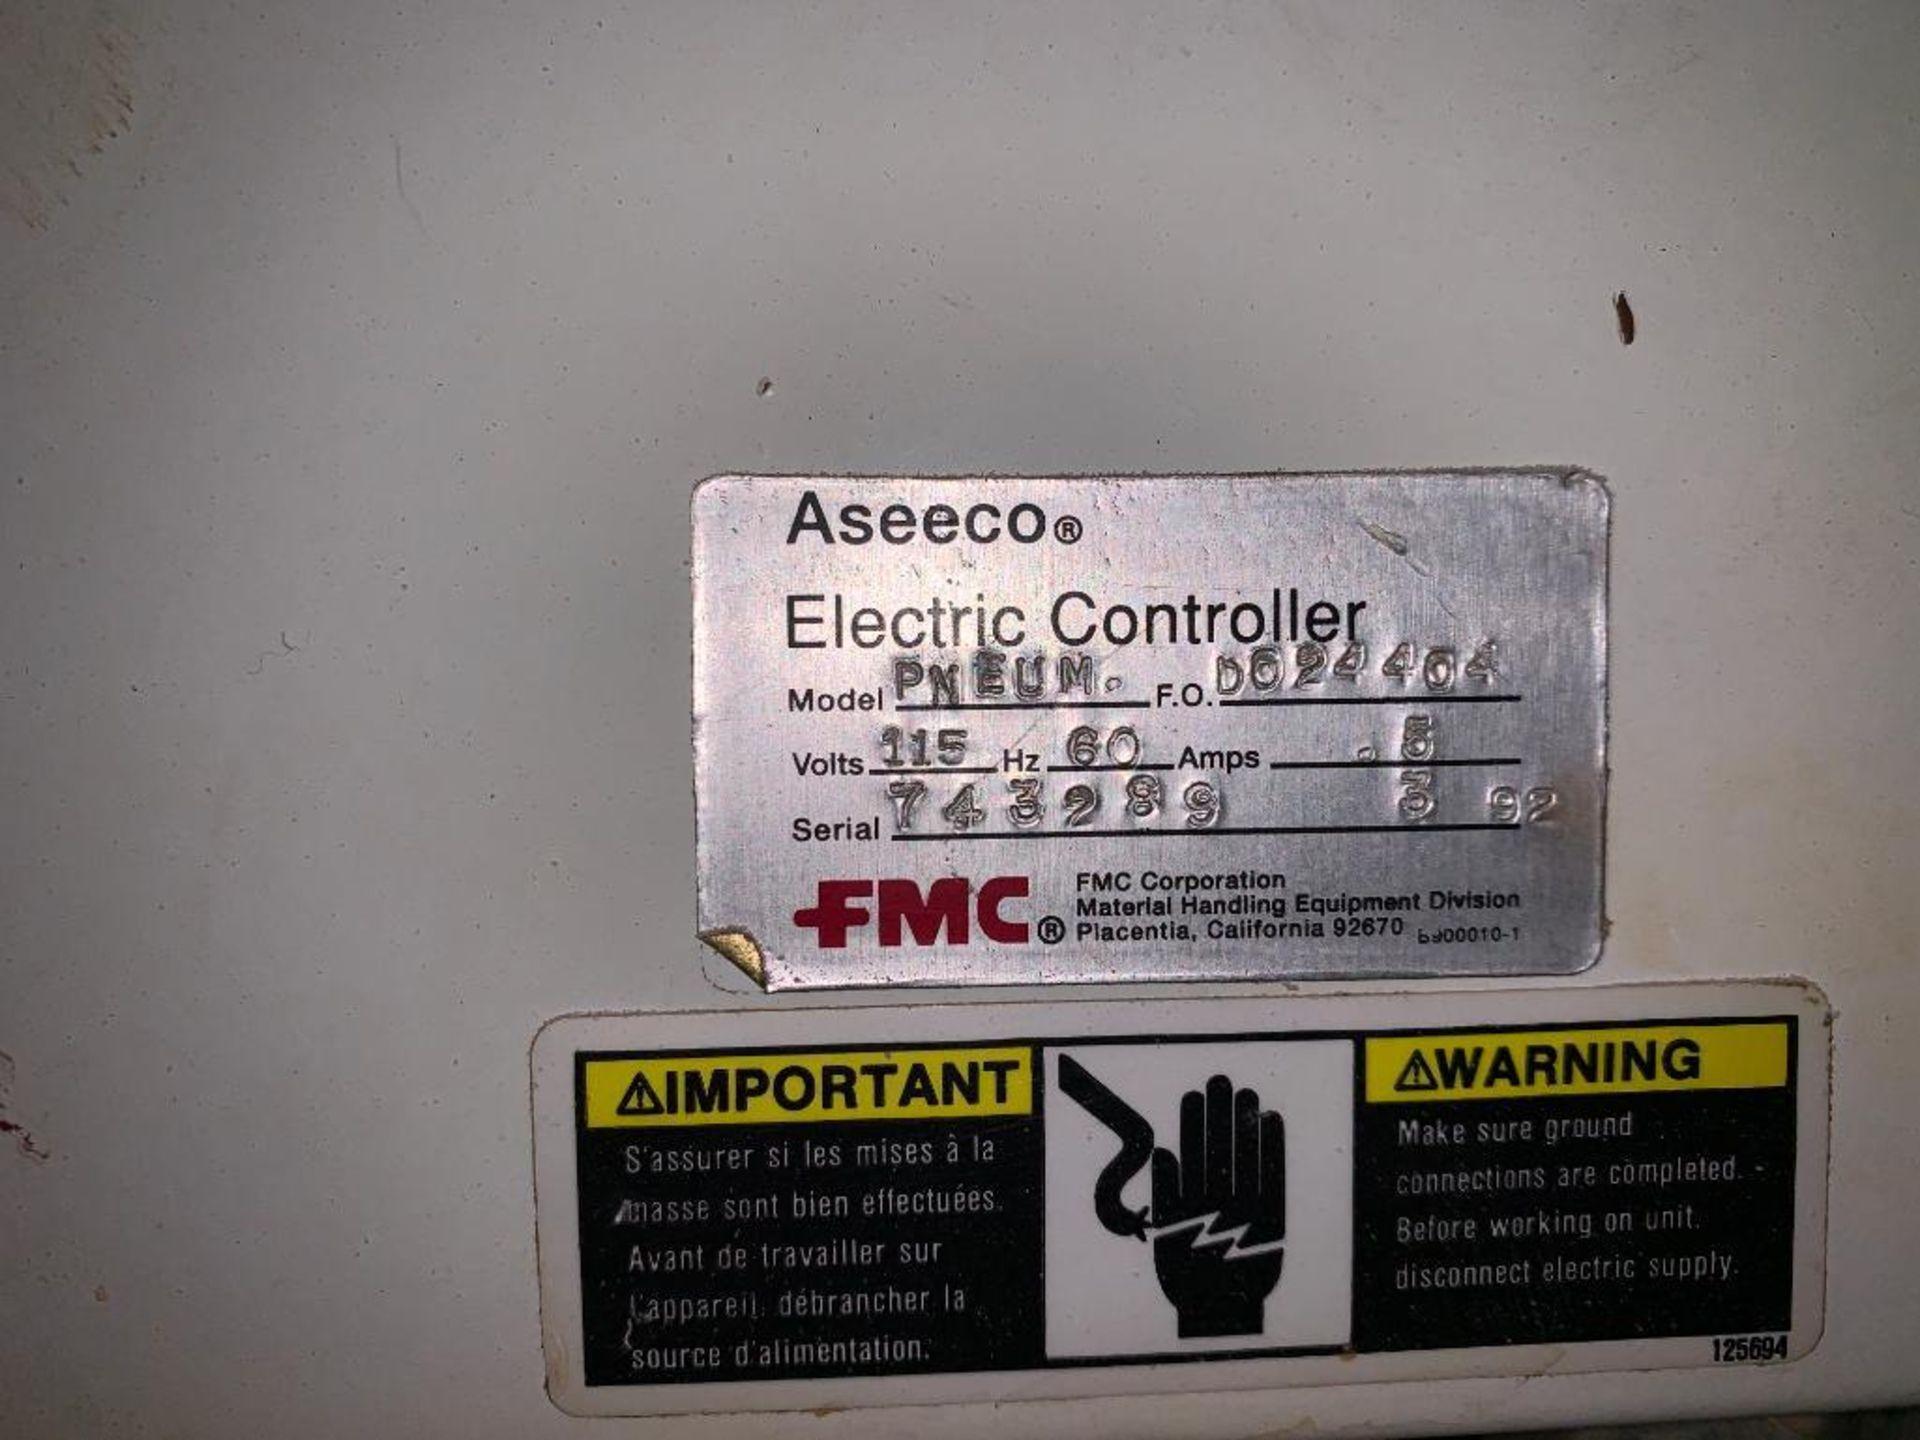 Aseeco mild steel cone bottom bulk storage bin - Image 12 of 16